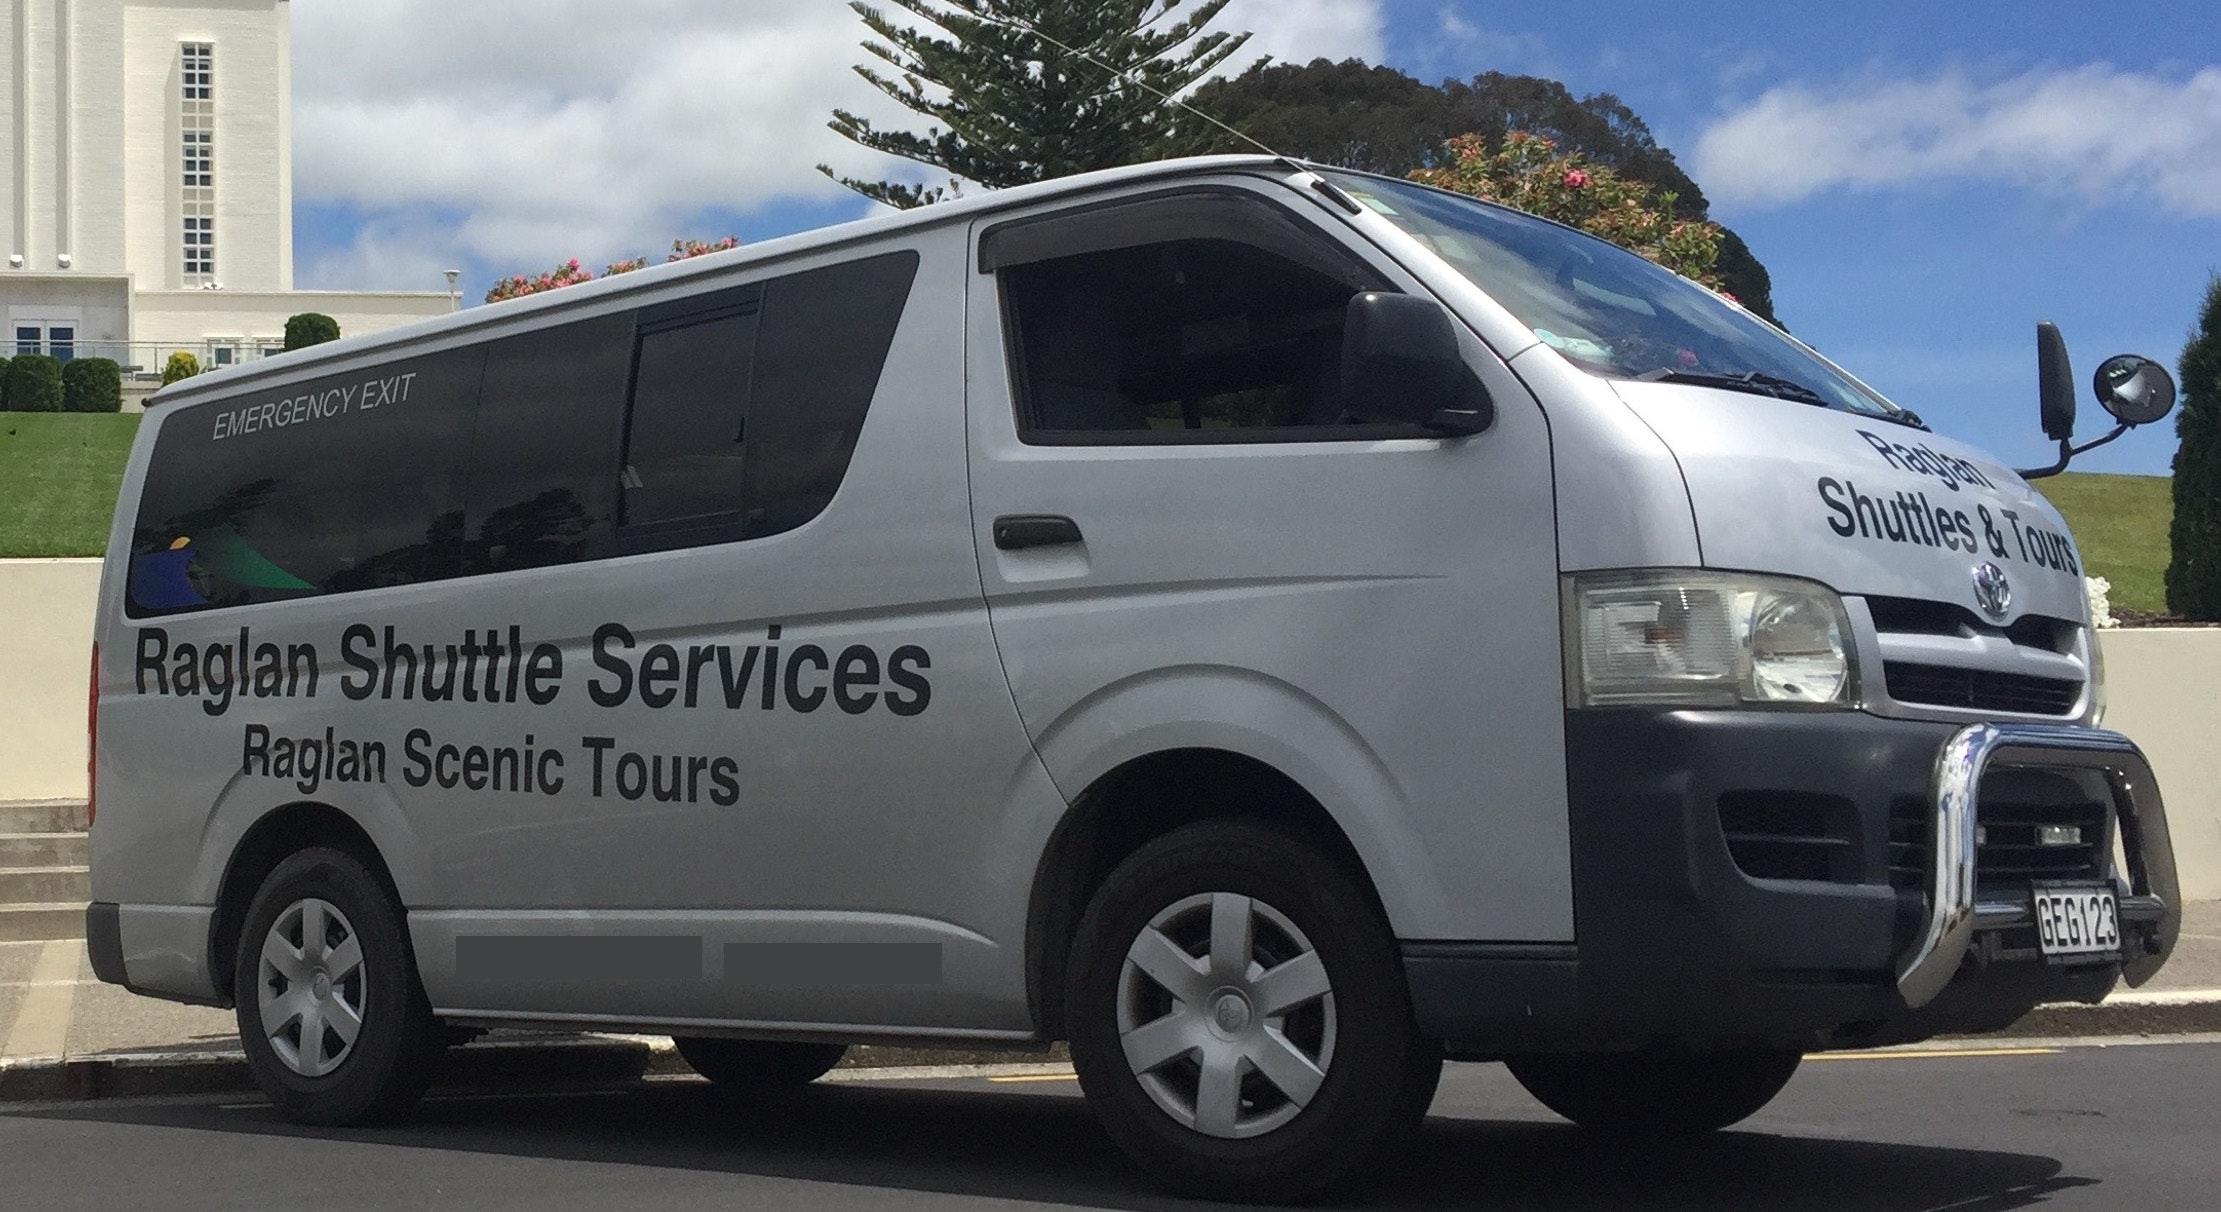 Raglan Scenic Tours & Raglan Shuttle Service vehicle 1